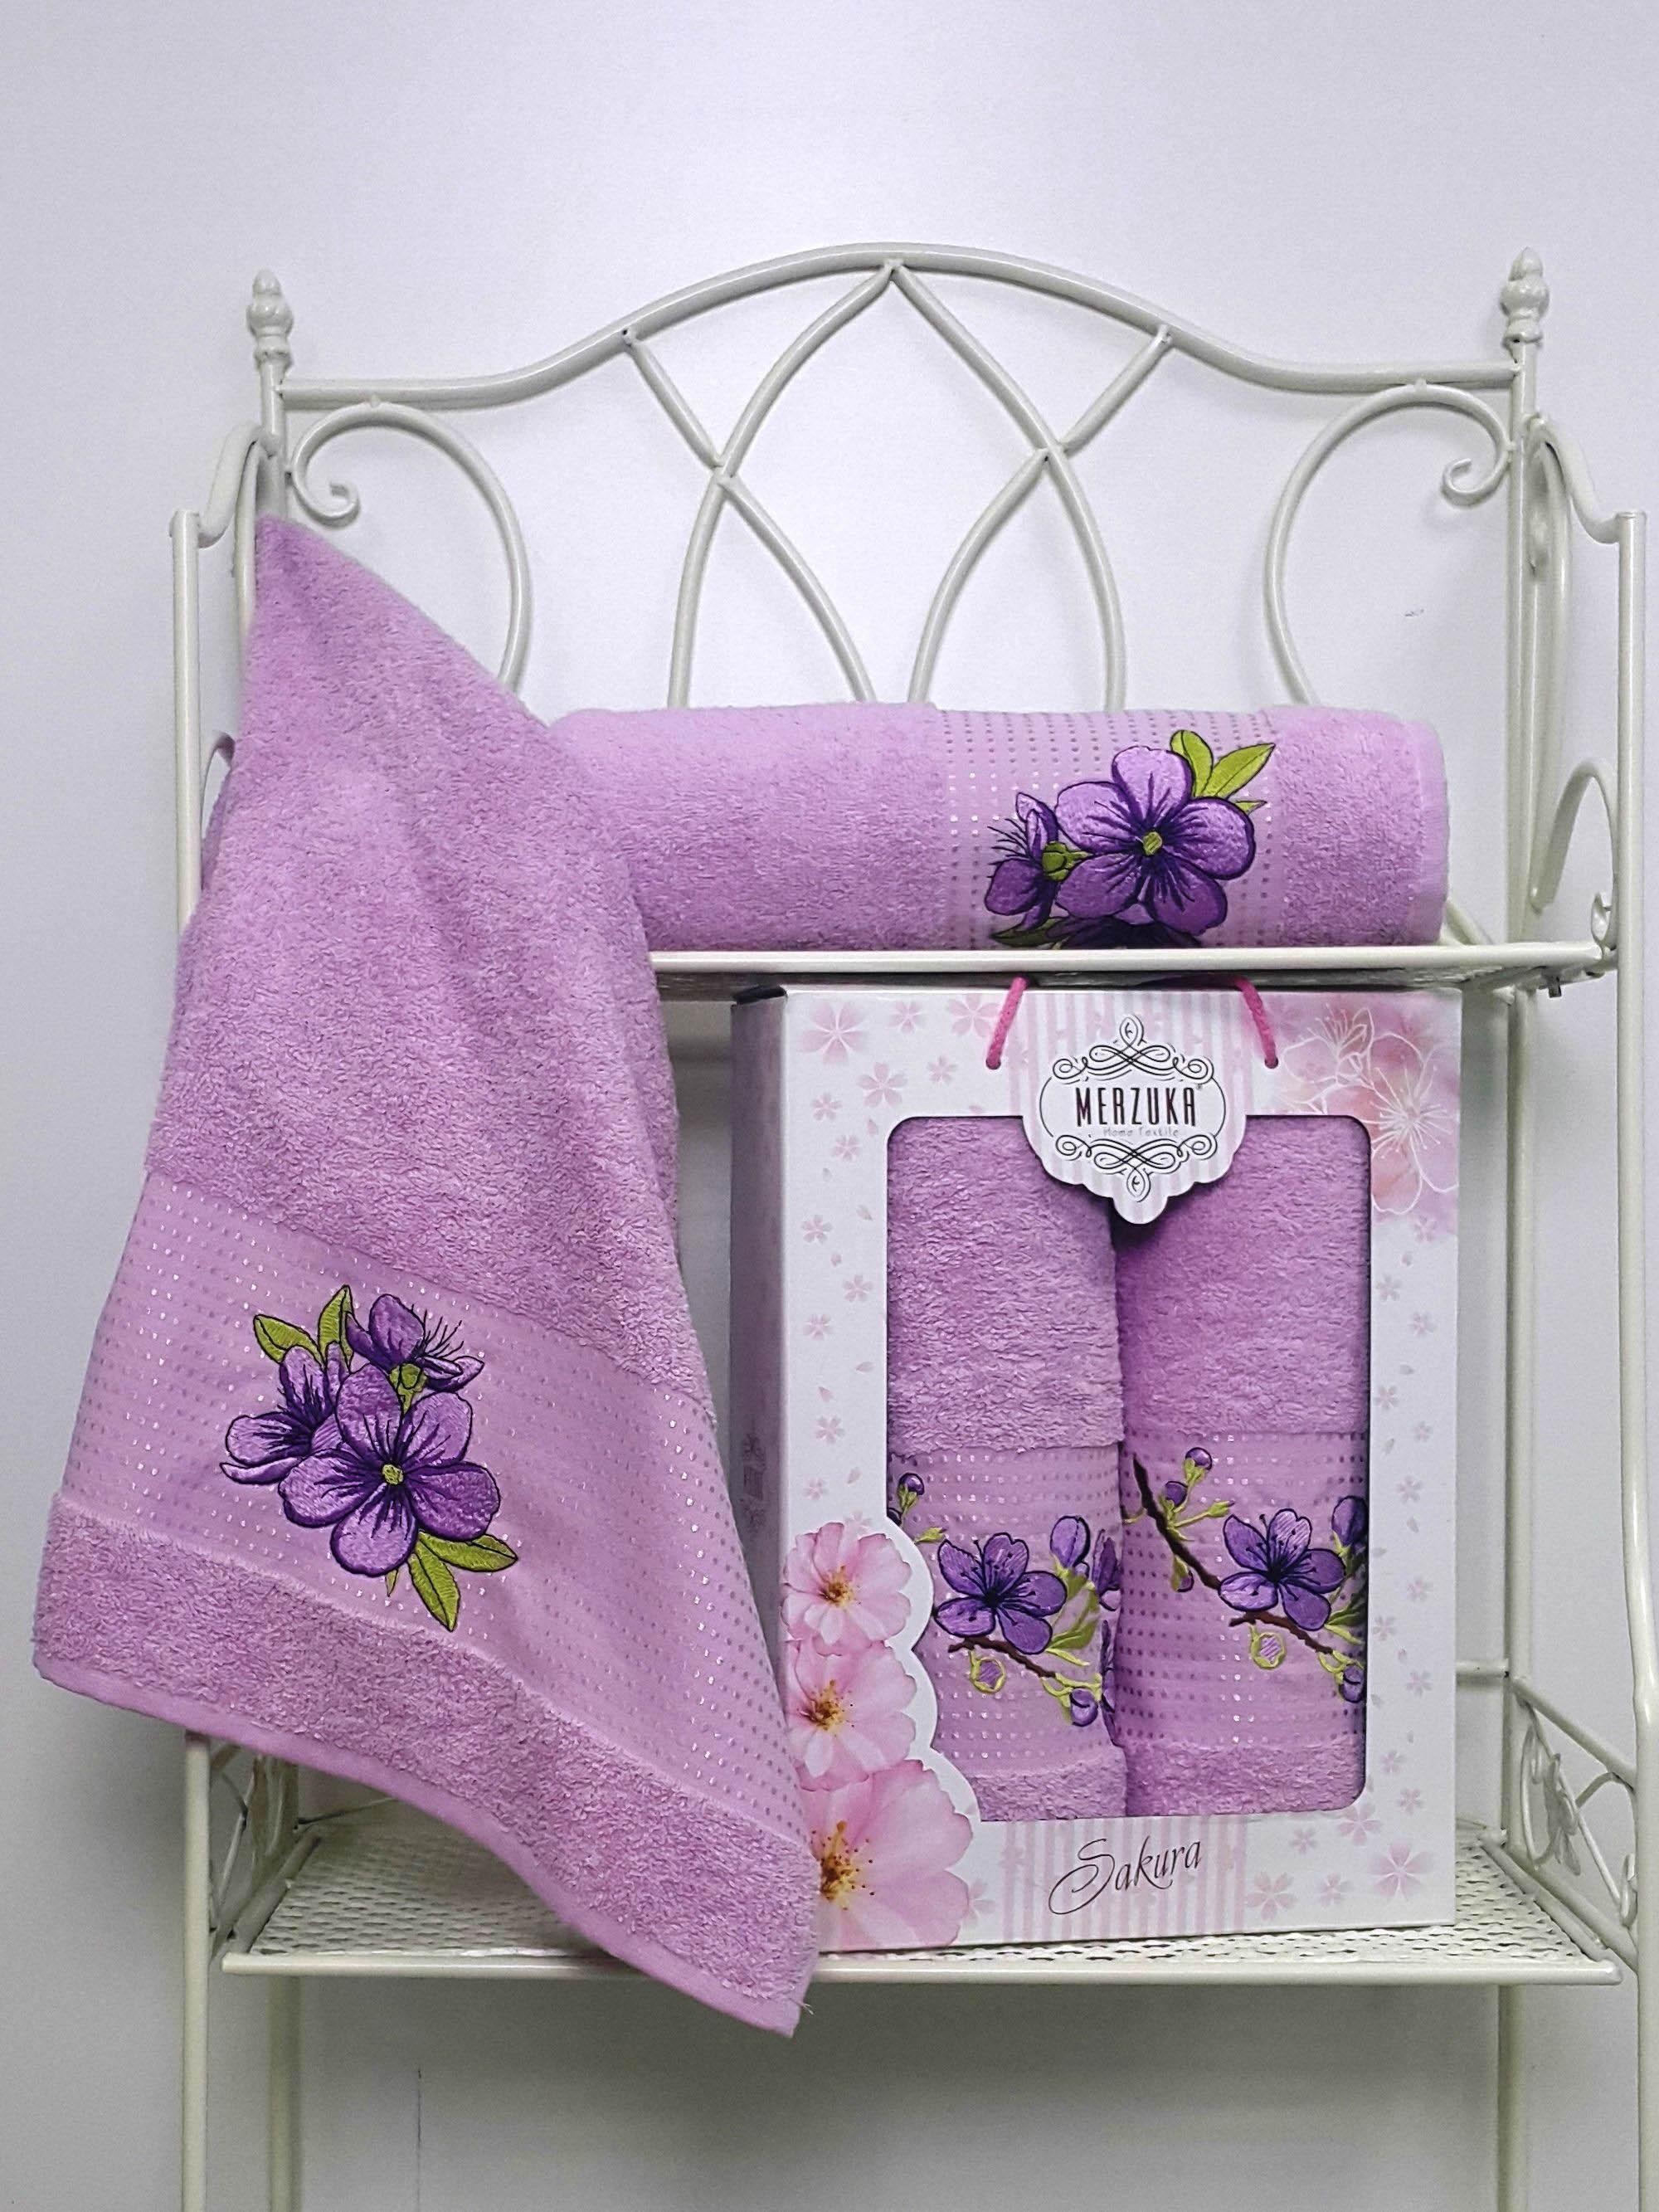 Полотенца Oran Merzuka Полотенце Sakura Цвет: Сиреневый (Набор) набор из 3 полотенец merzuka sakura 50х90 2 70х140 8432 терракотовый